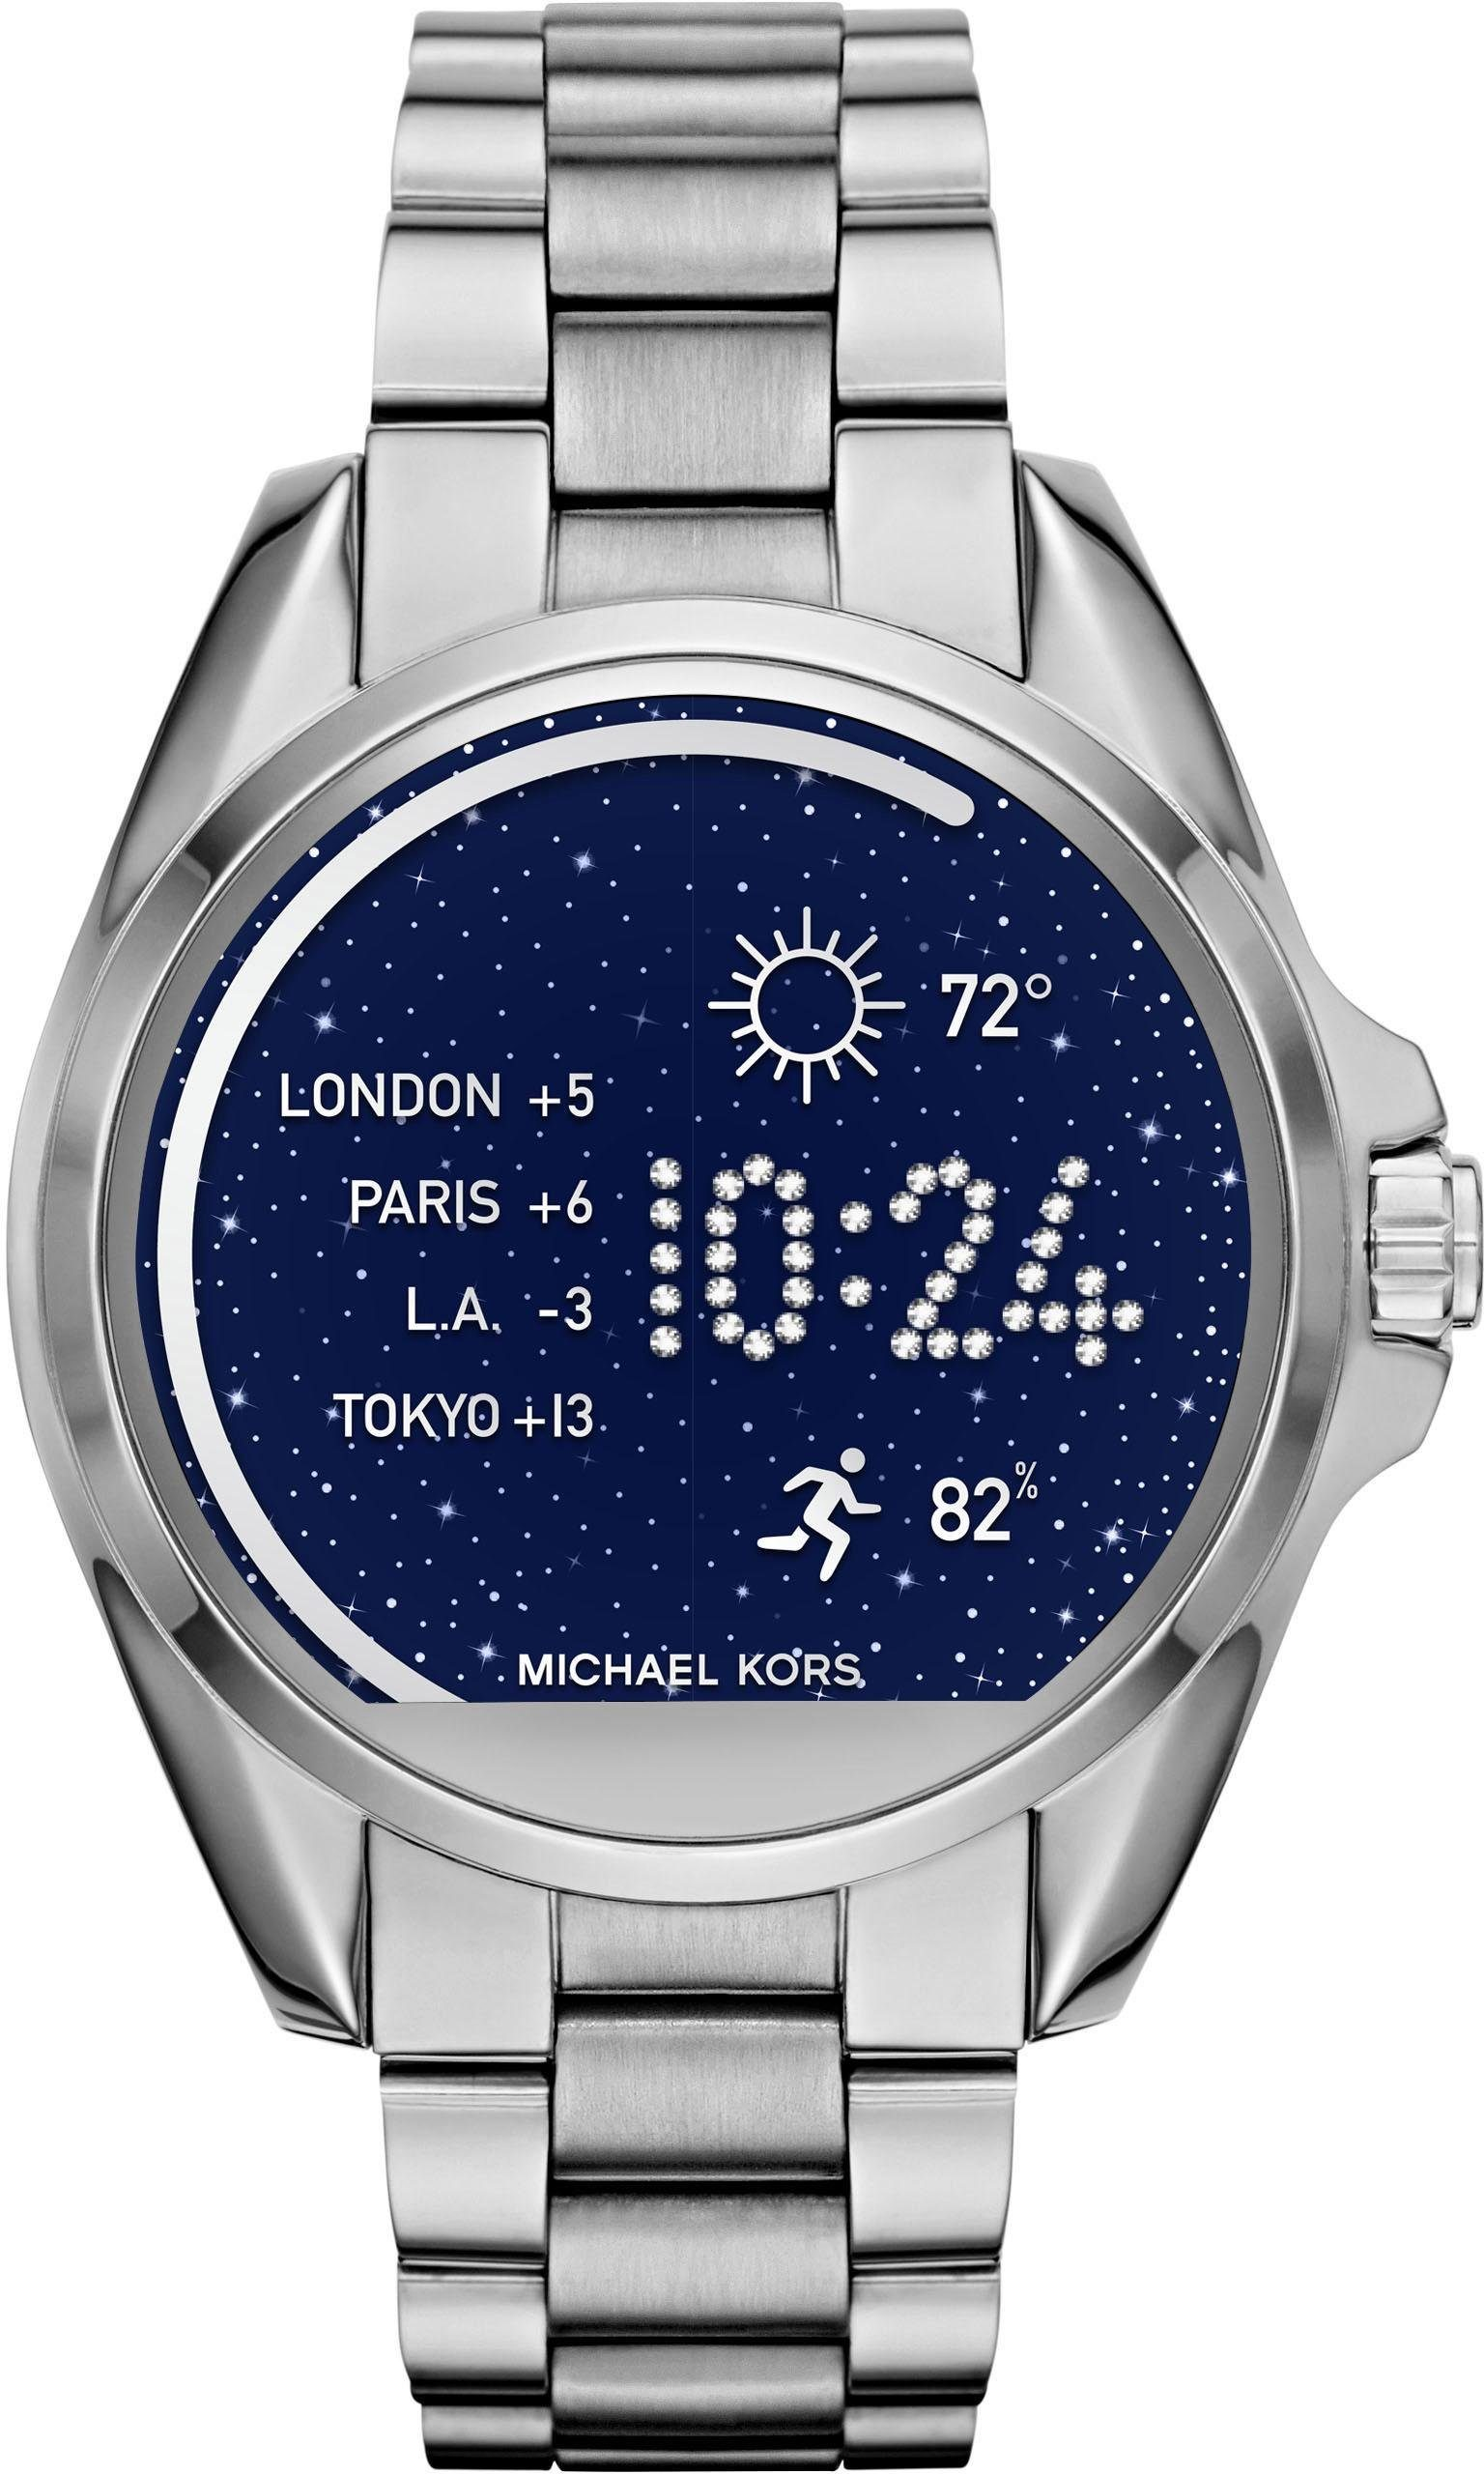 MICHAEL KORS ACCESS BRADSHAW, MKT5012 Smartwatch (Android Wear, inkl. Dornschließe für Wechselband)